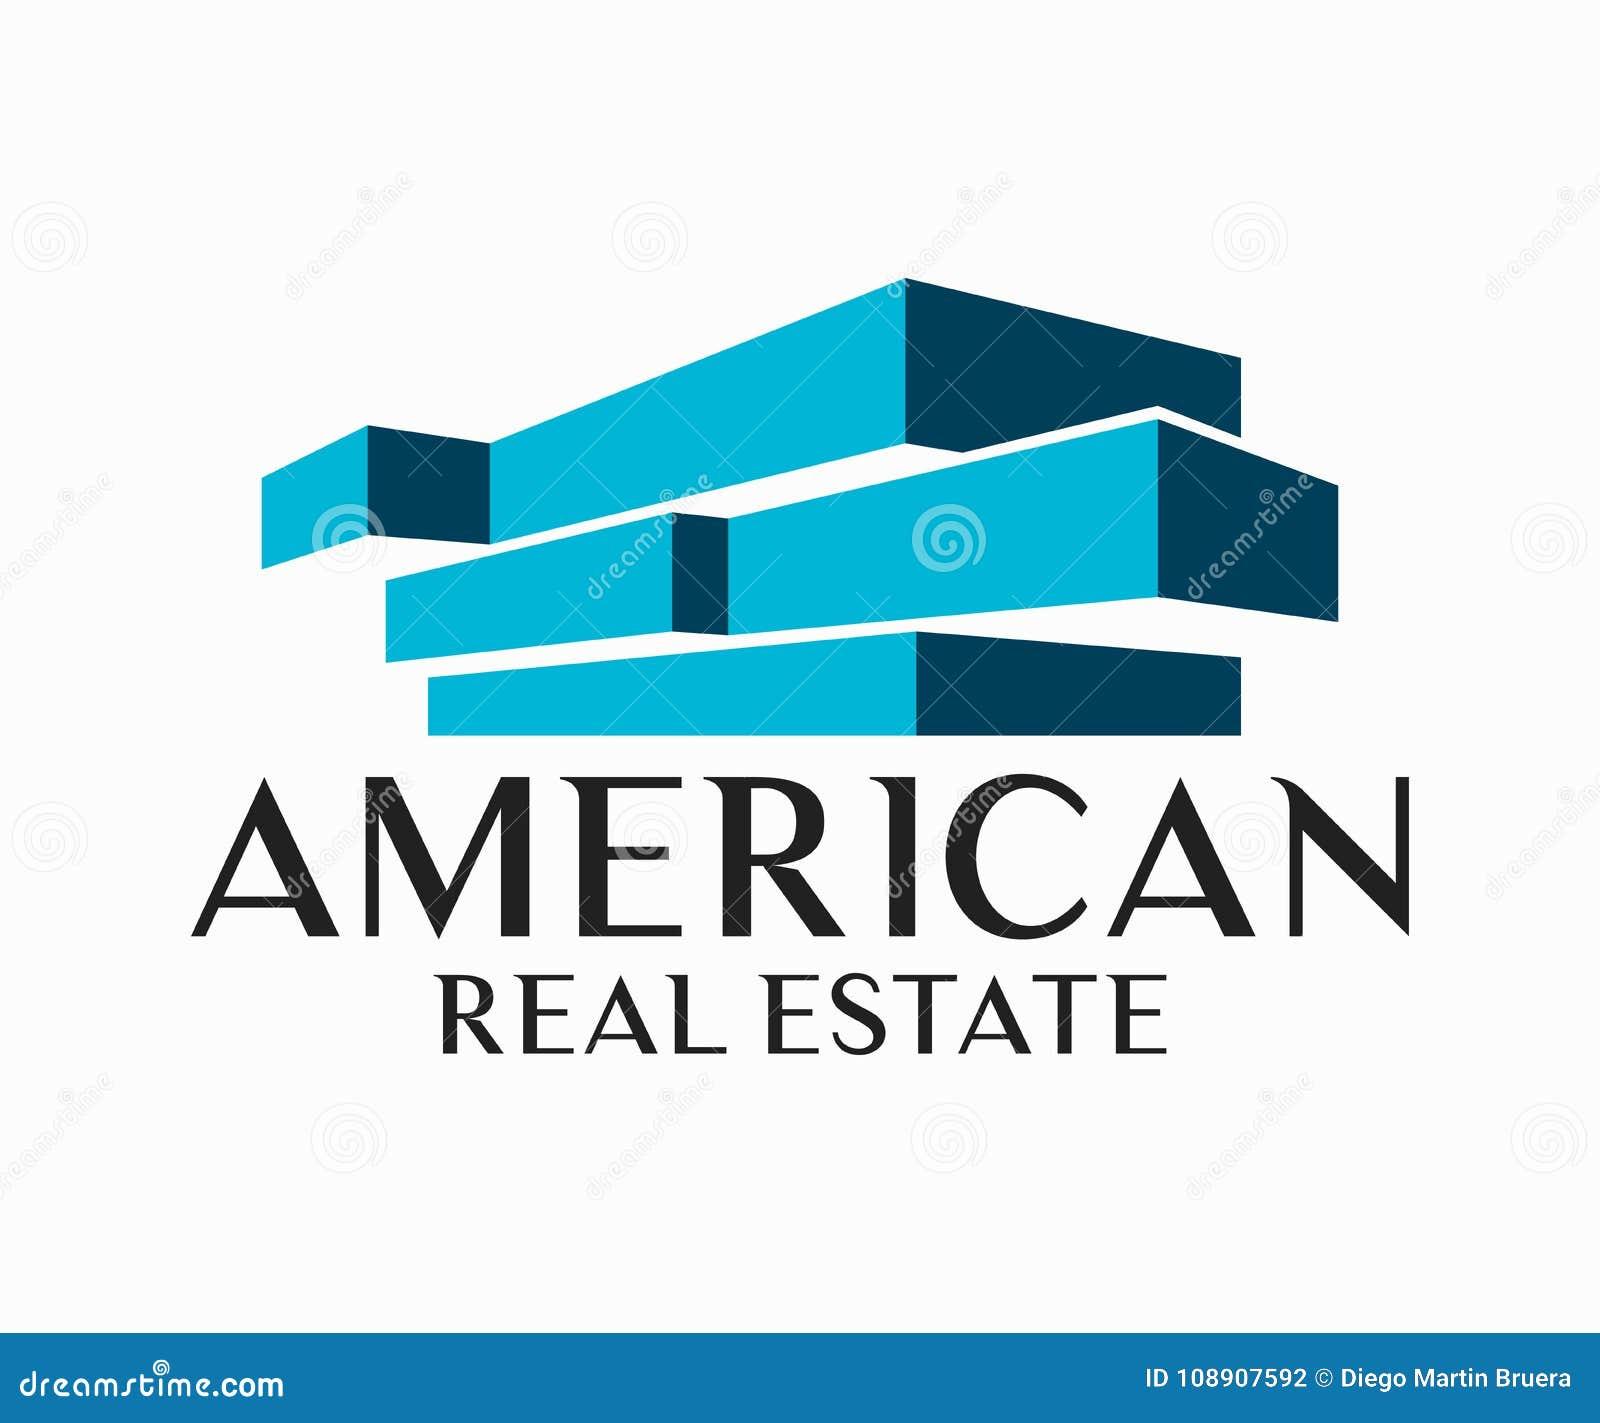 Real Estate, de Bouw, Bouw en Architectuur Logo Vector Design